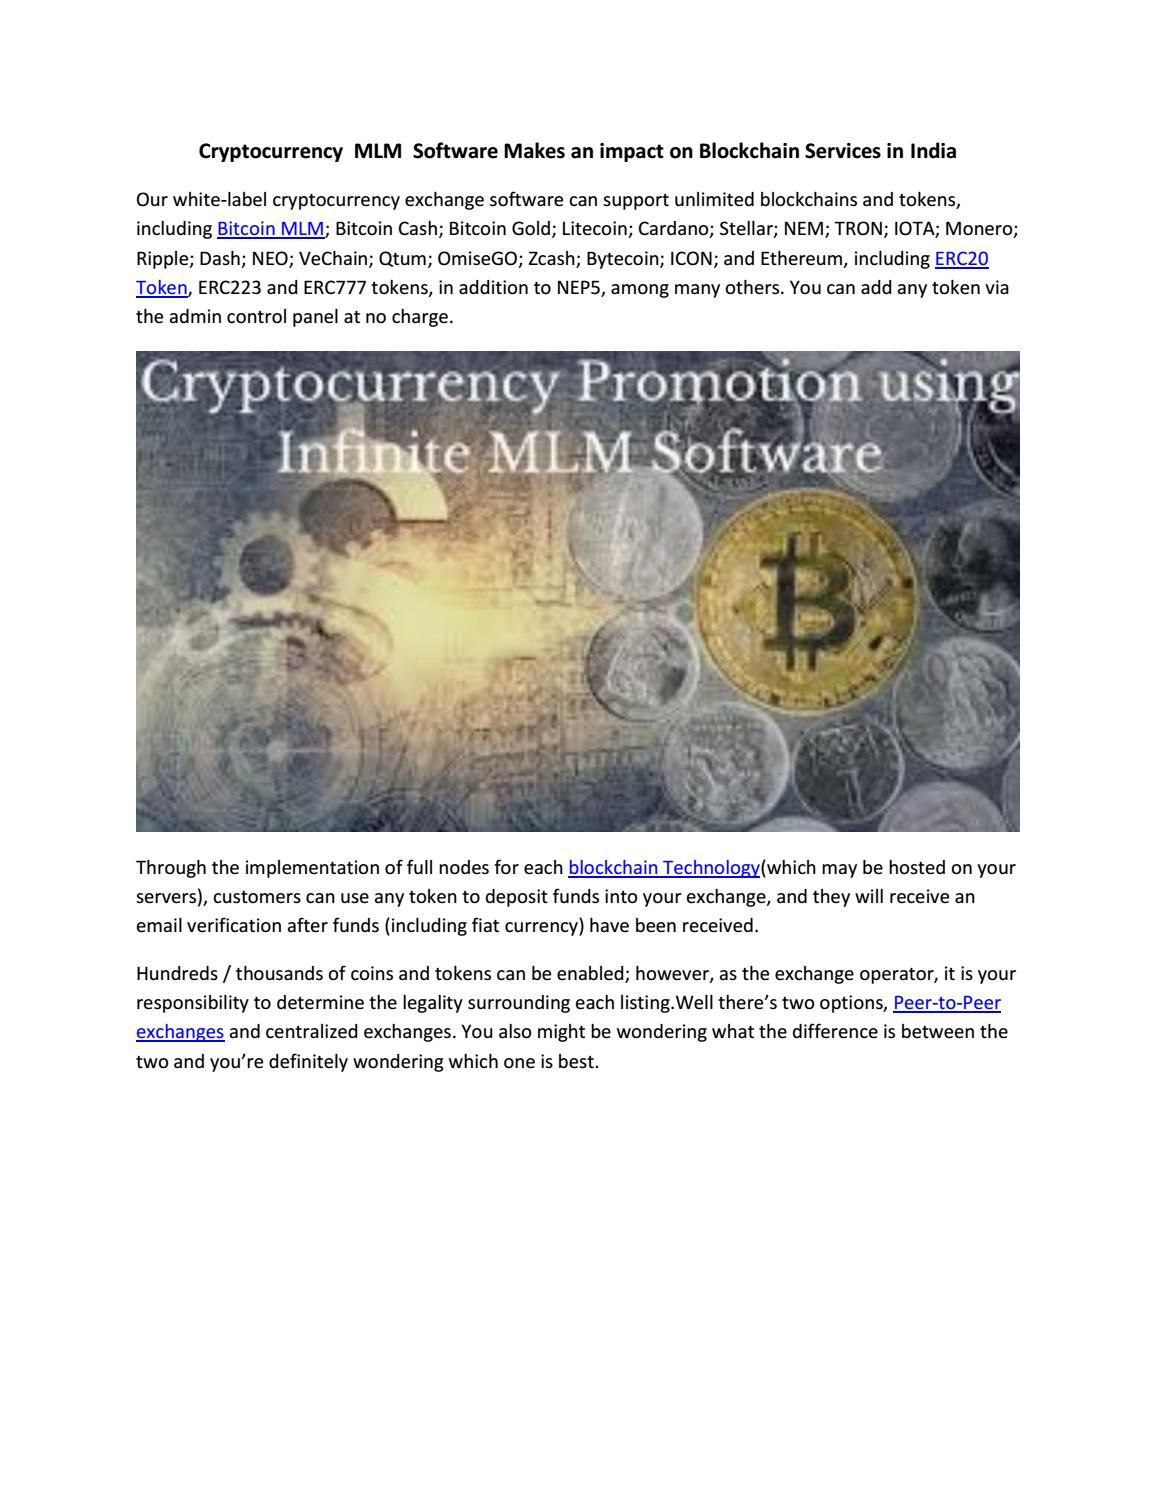 neo cryptocurrency buy india